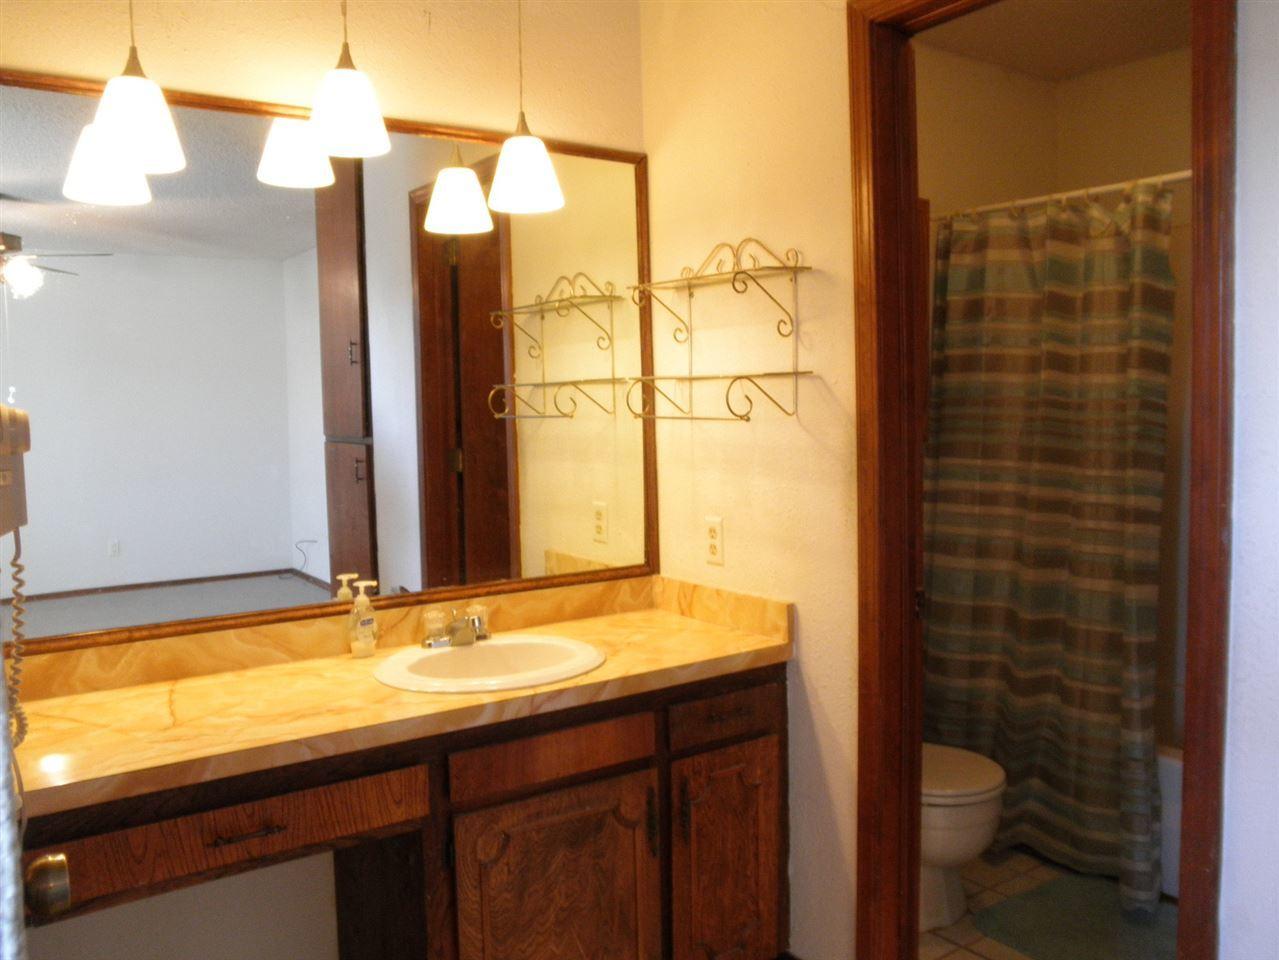 Sold Cross Sale W/ MLS | 2516 Oriole  Ponca City, OK 74601 20